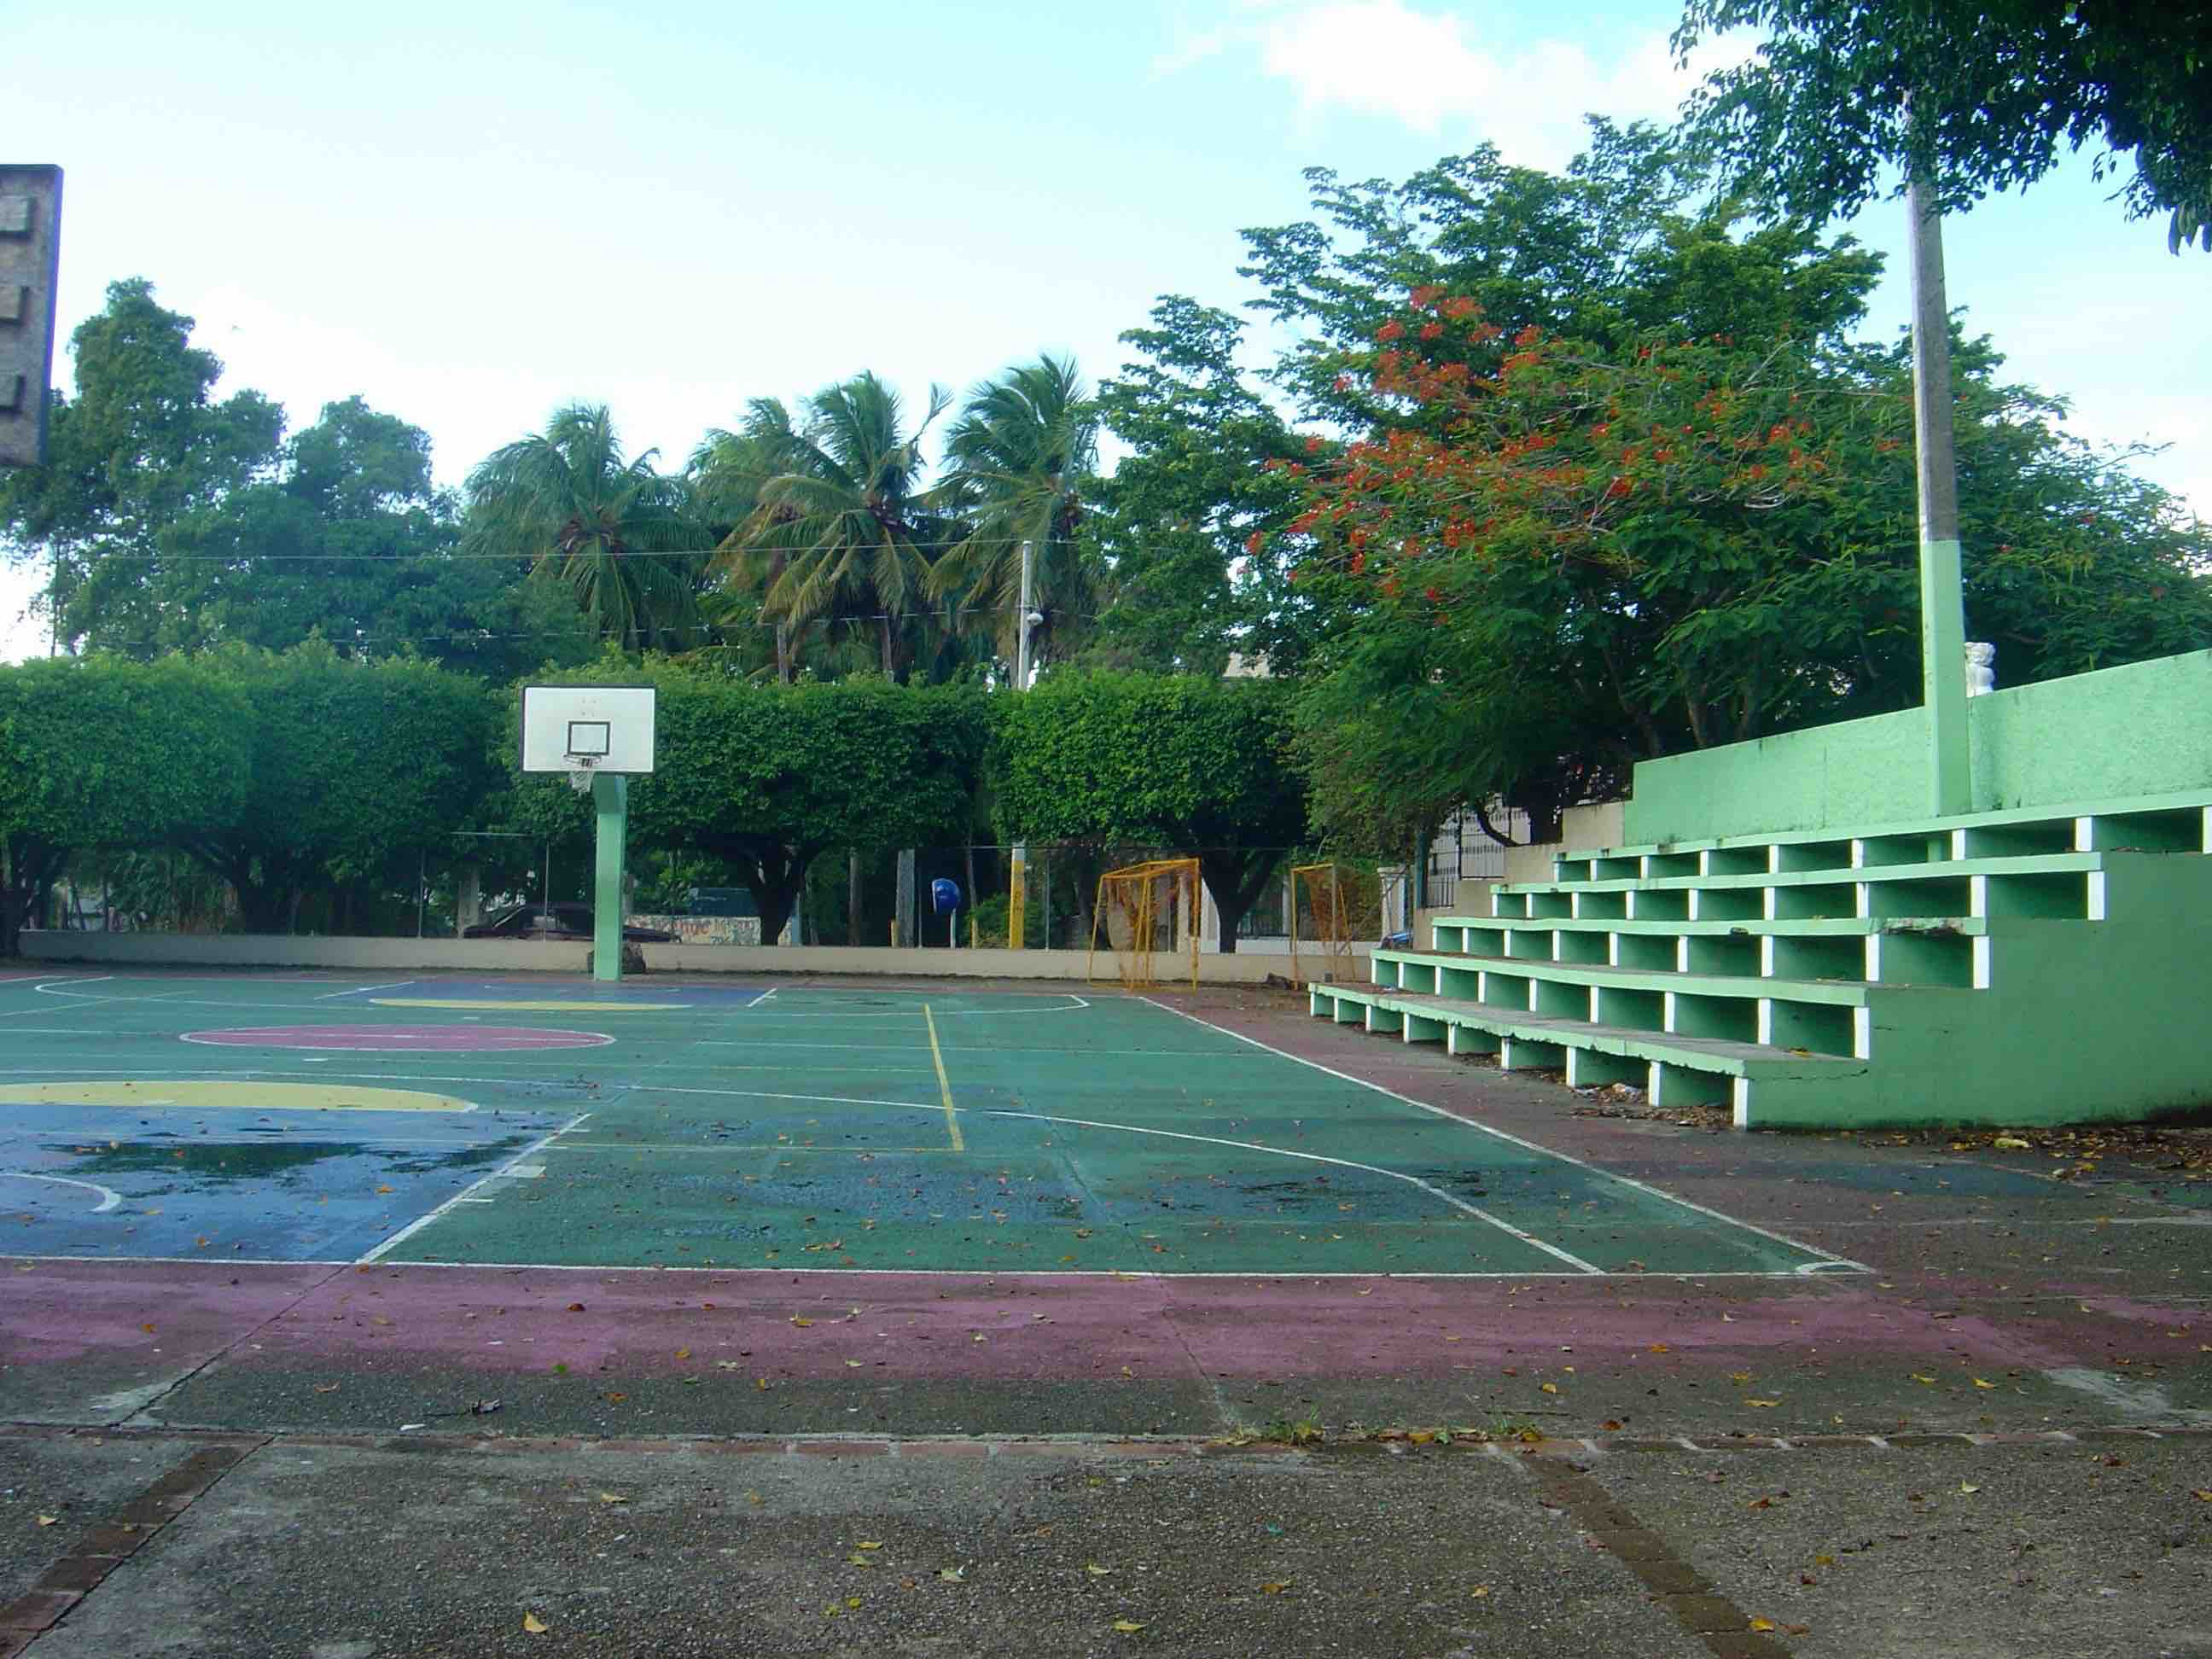 cancha-parquecentral-sport-riosanjuan-miriosanjuan.jpg